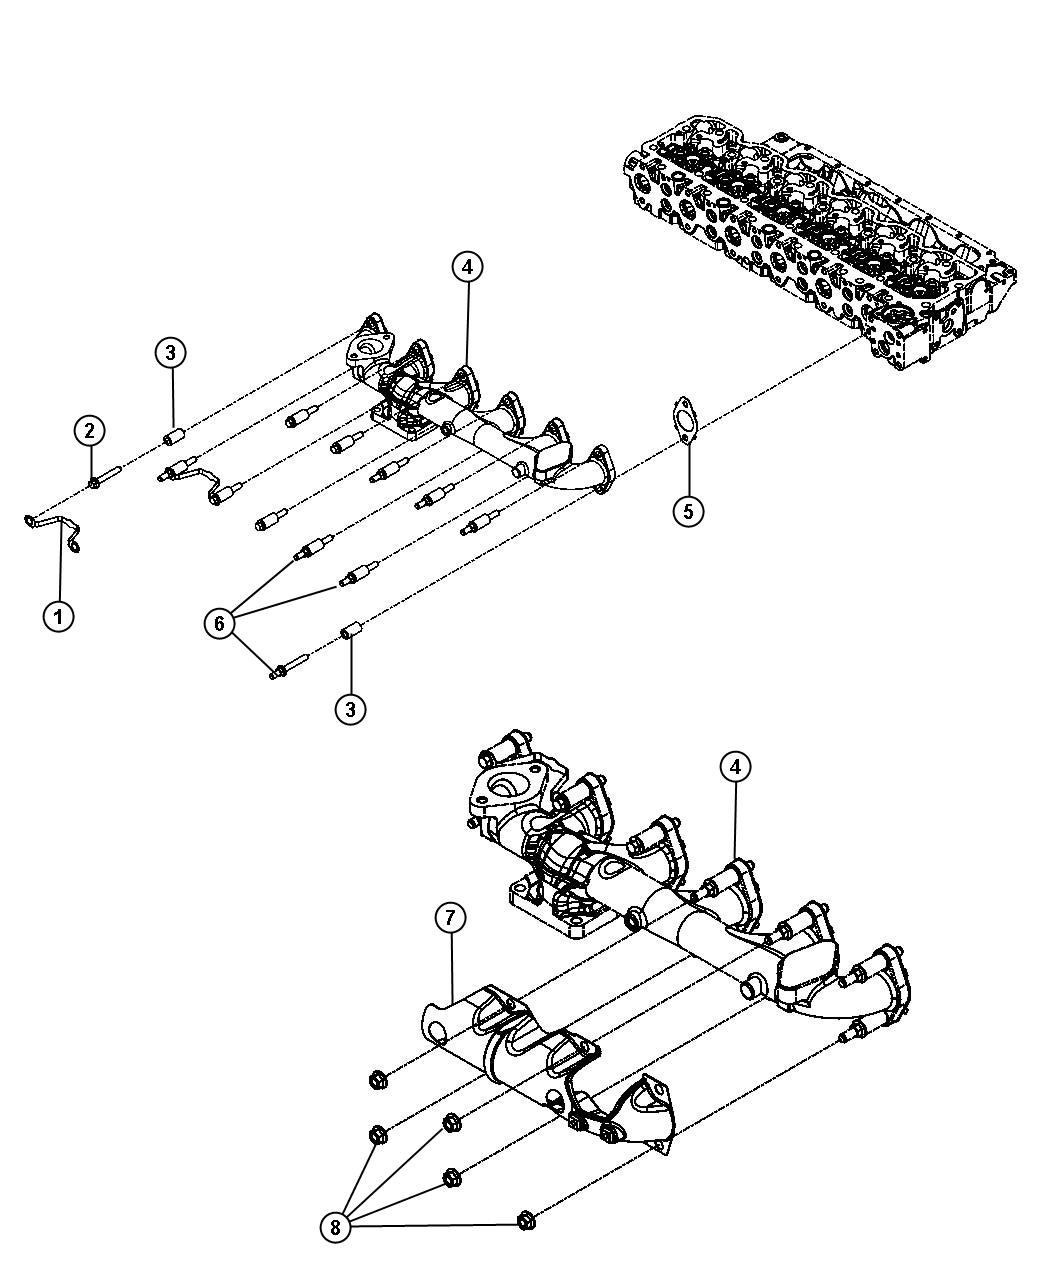 Dodge Ram Shield Heat Exhaust Manifold Emissions